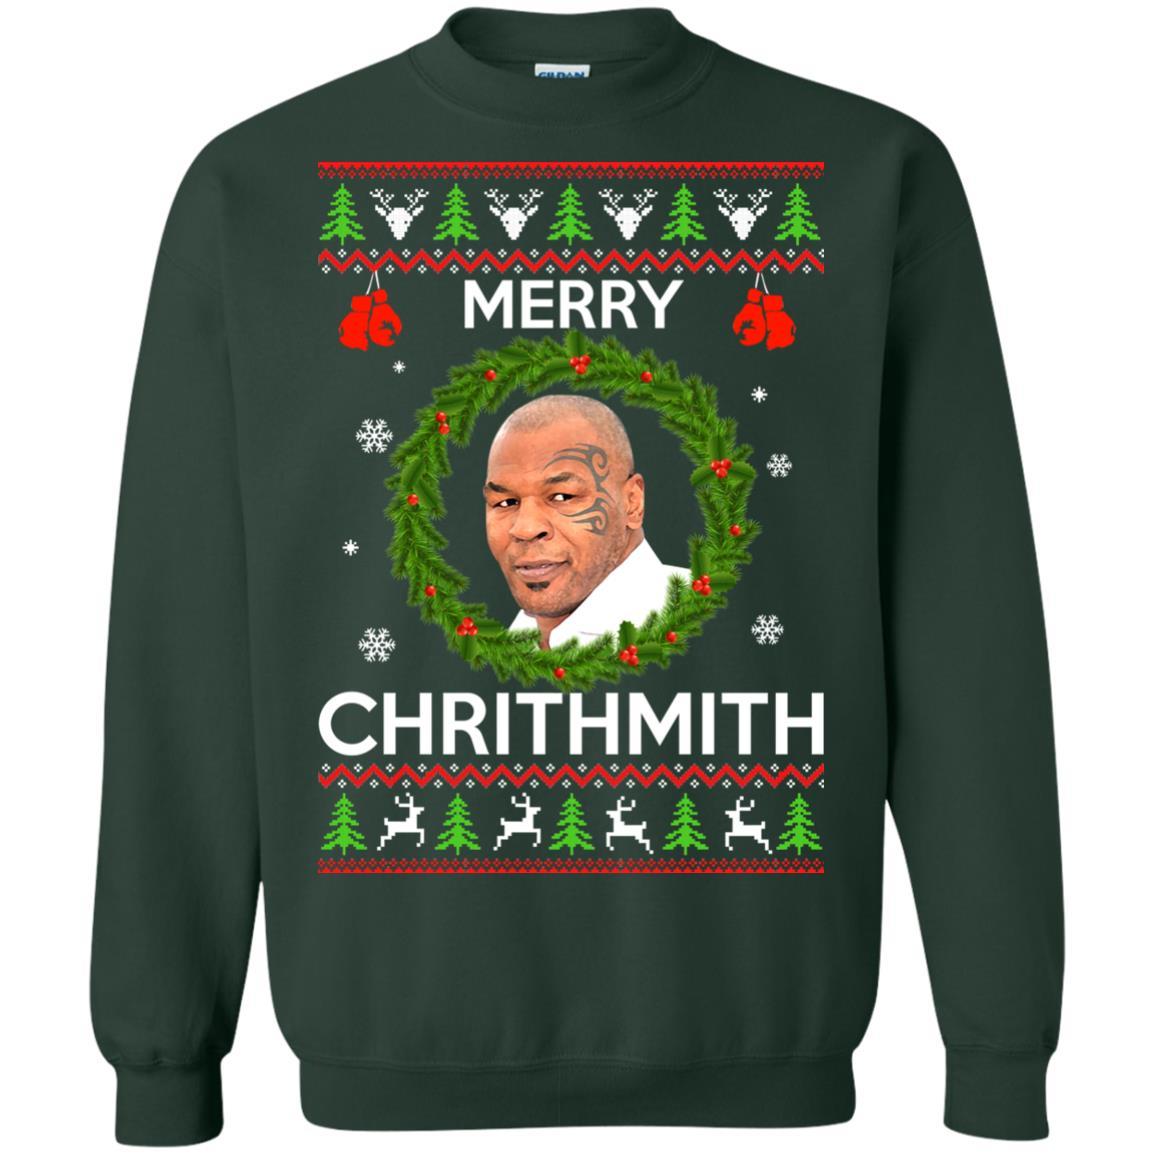 image 844px Mike Tyson Christmas Sweater Merry Chrithmith Sweatshirt